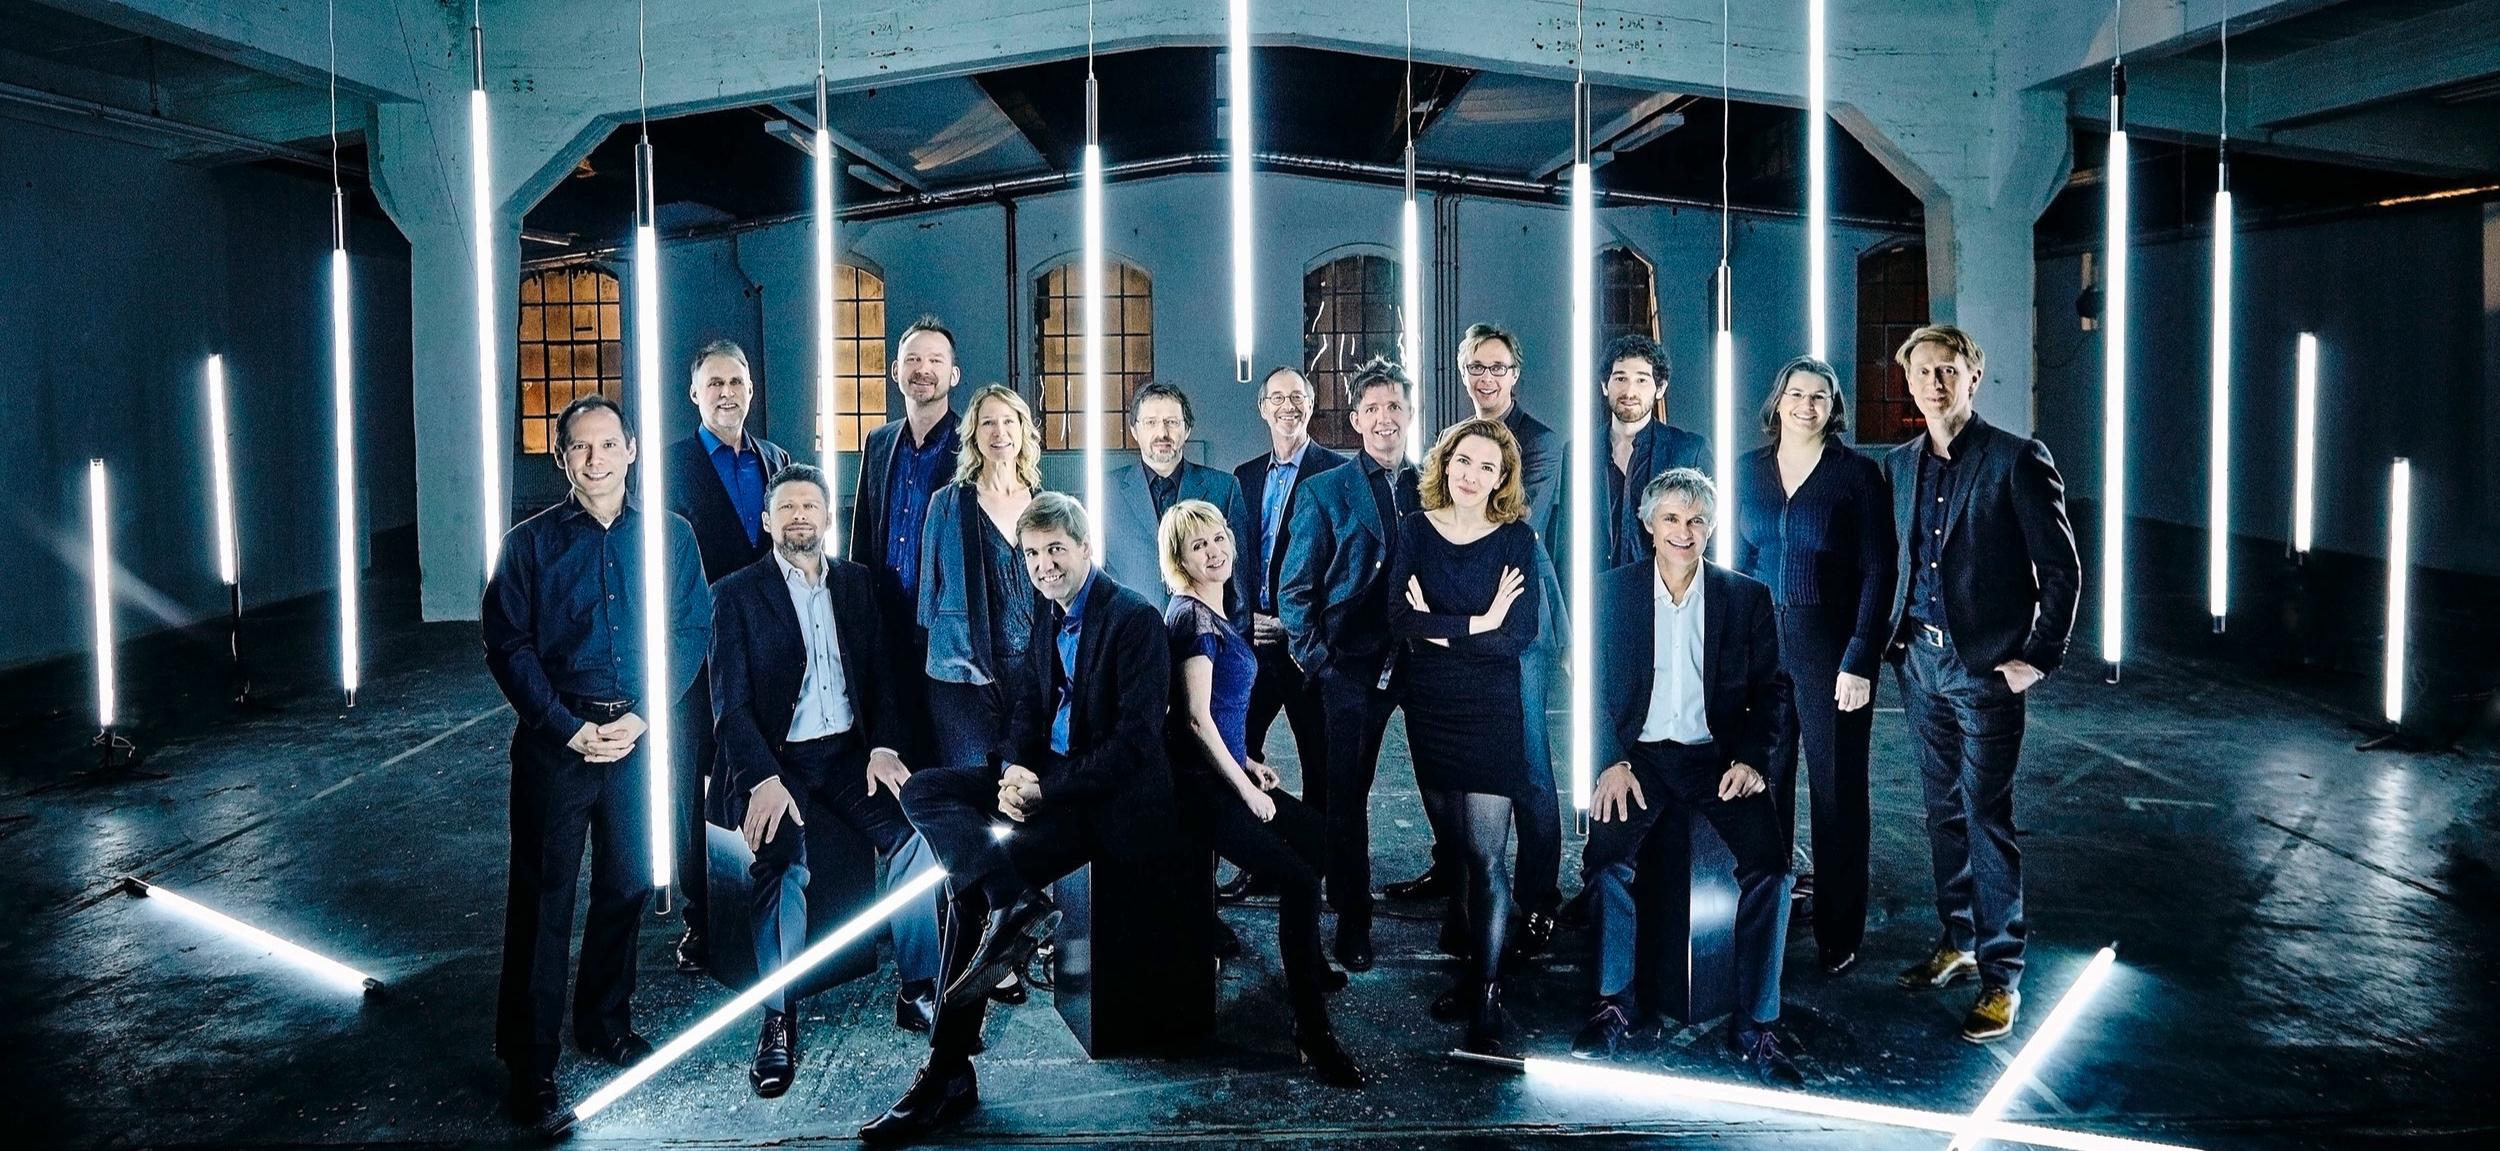 Event-1-Ensemble-Musikfabrik-%C2%A9-Jonas-Werner-Hohensee.jpg